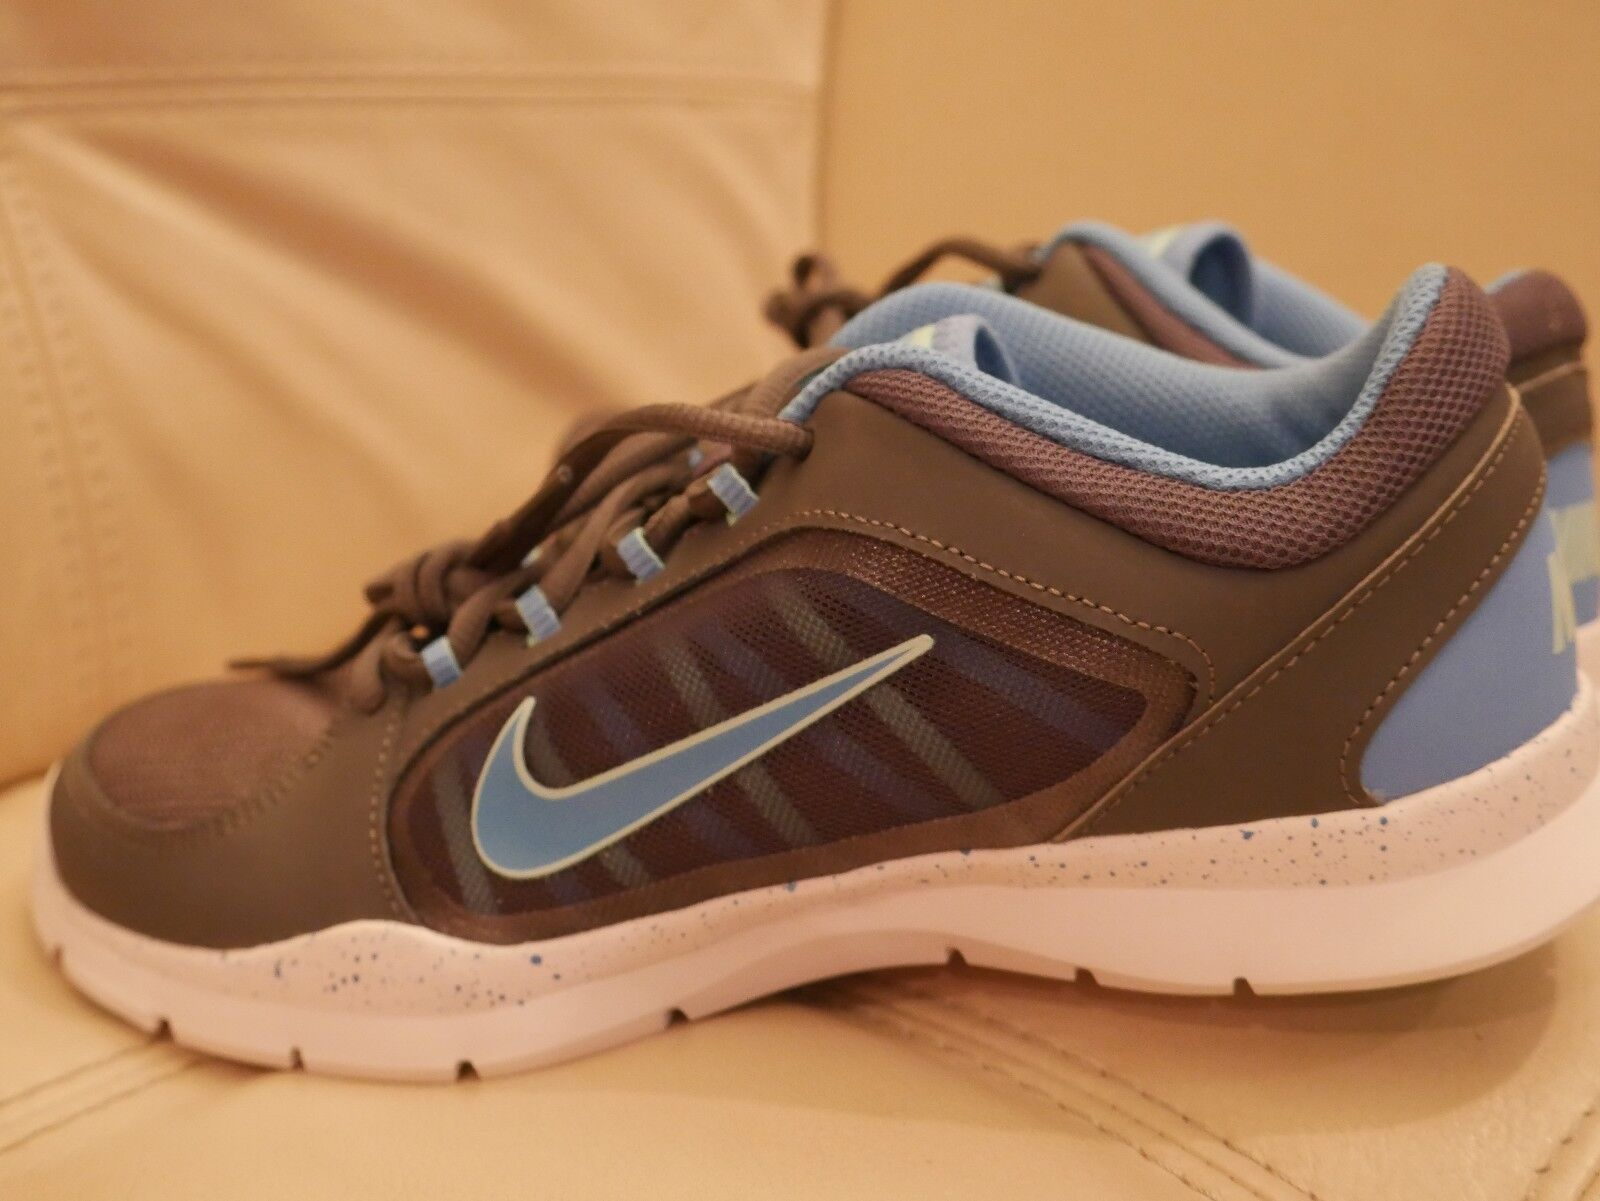 NEW Women's Nike Flex Trainer Tennis shoes DARK GRAY BLUE  8.5,11